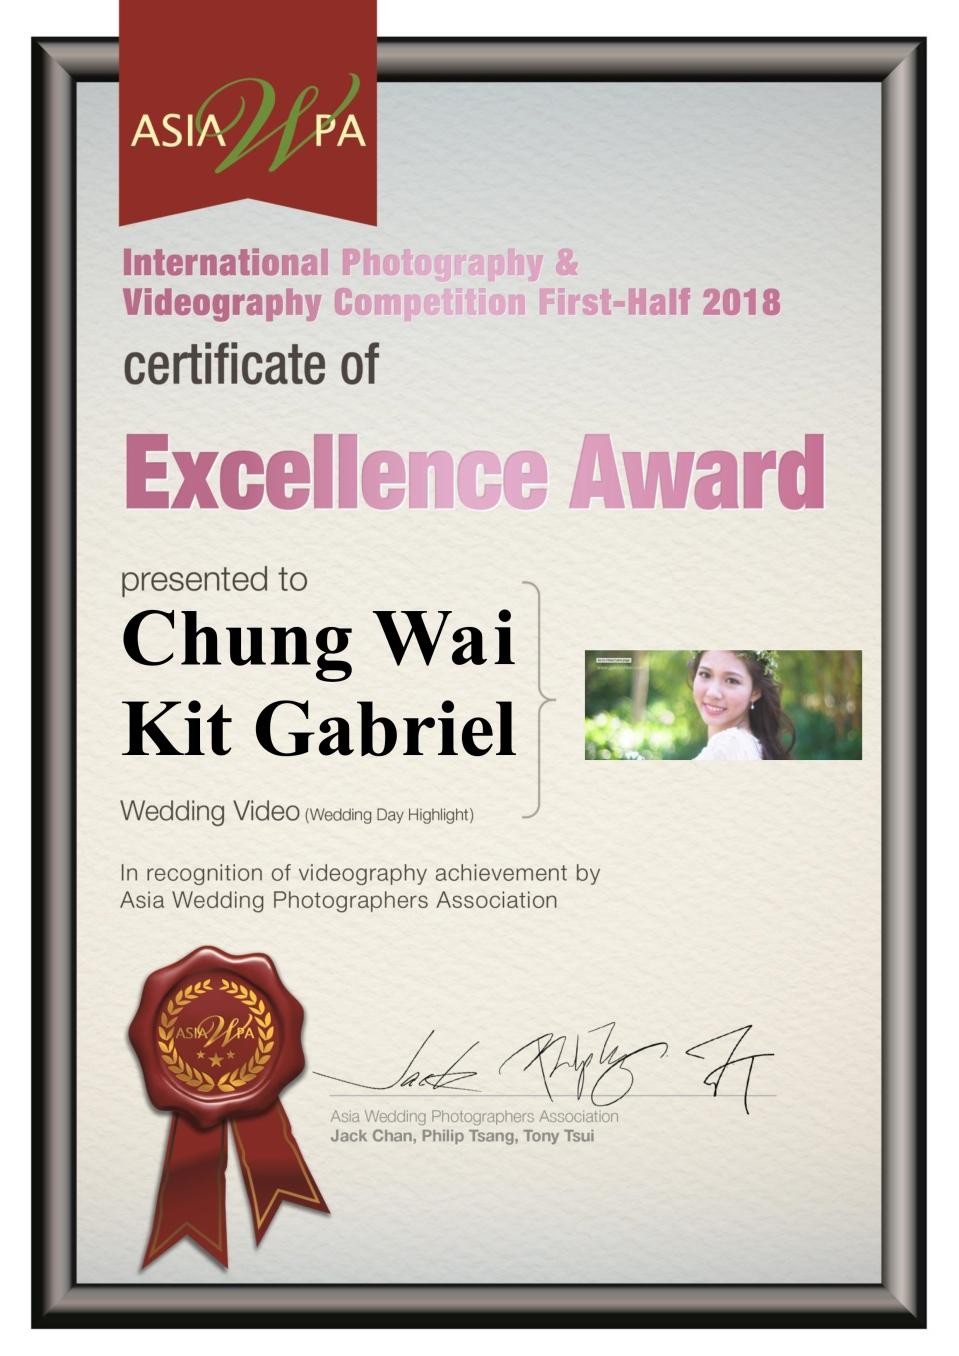 gabrielvideo execellence award.jpg